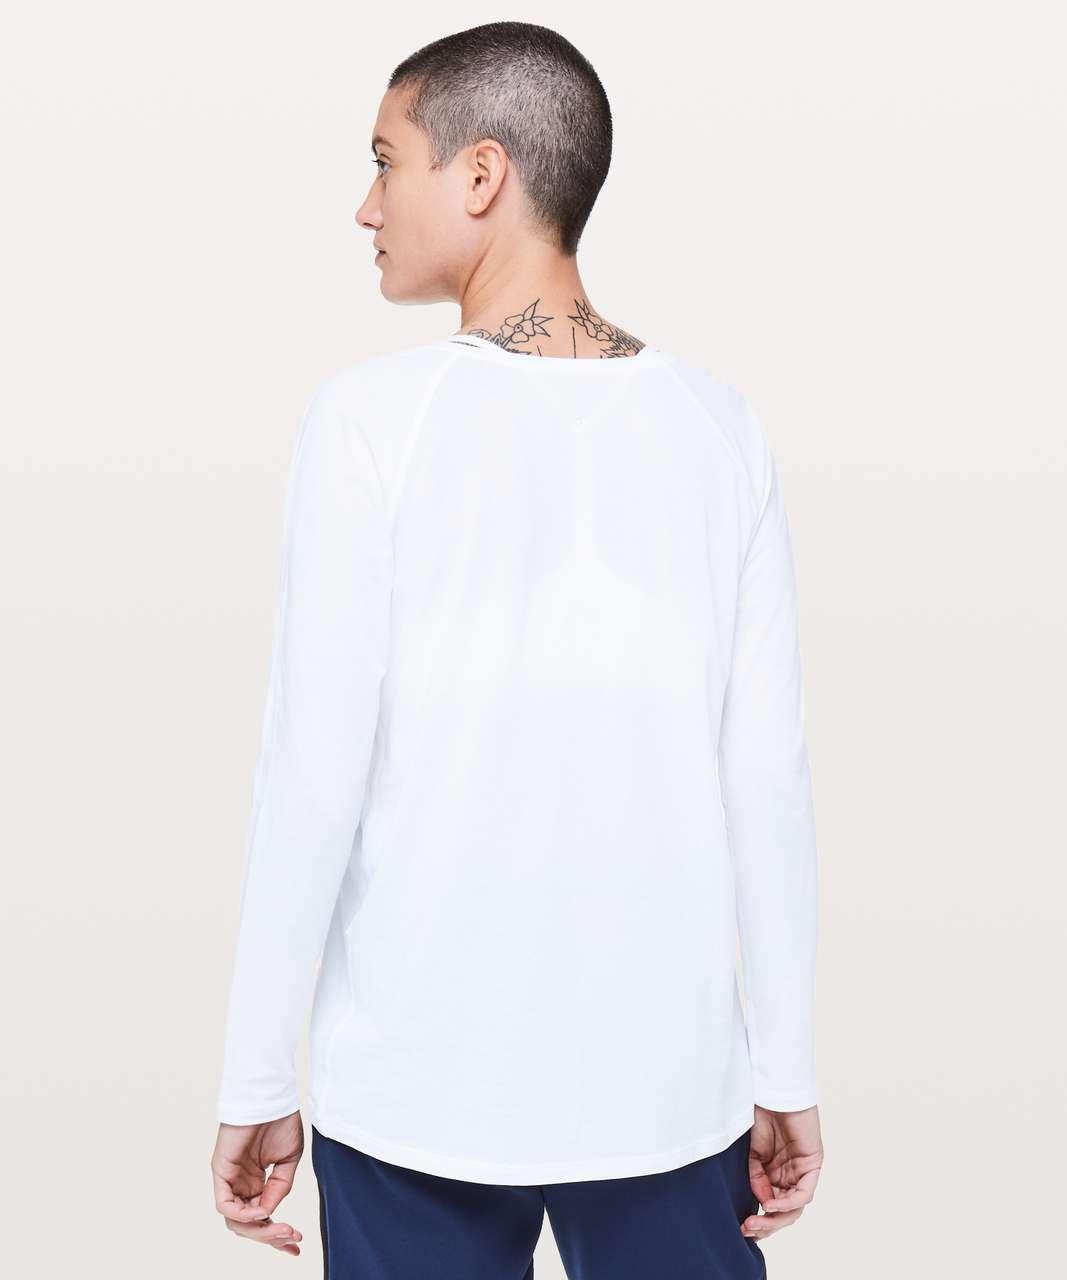 Lululemon Emerald Long Sleeve - White (Second Release)